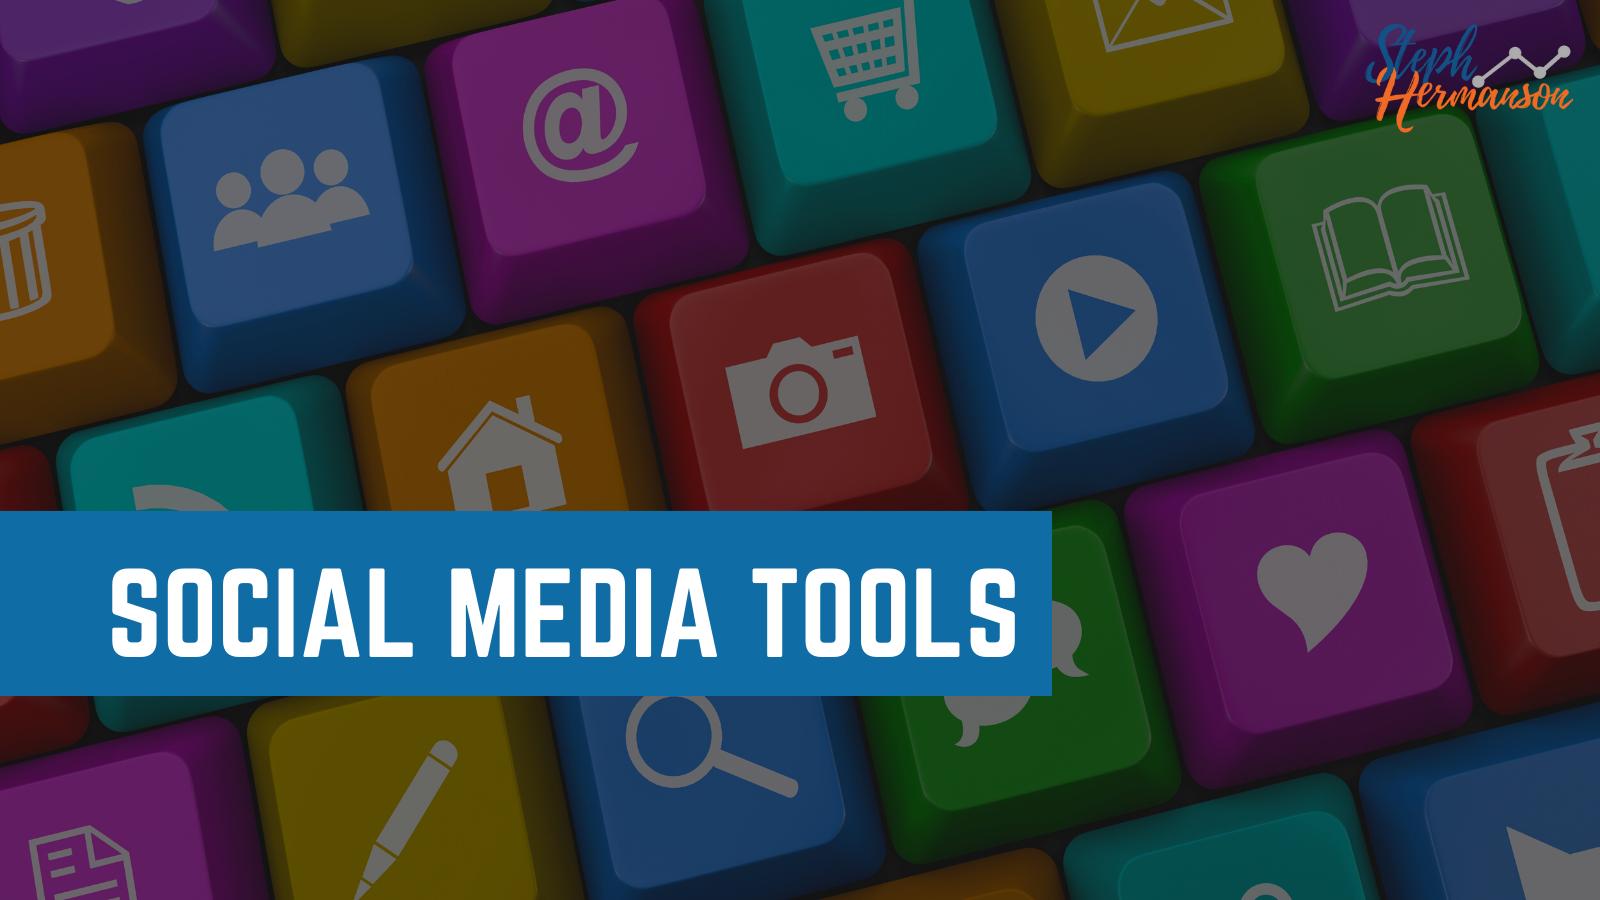 social media tools digital marketing teams 2021 steph hermanson